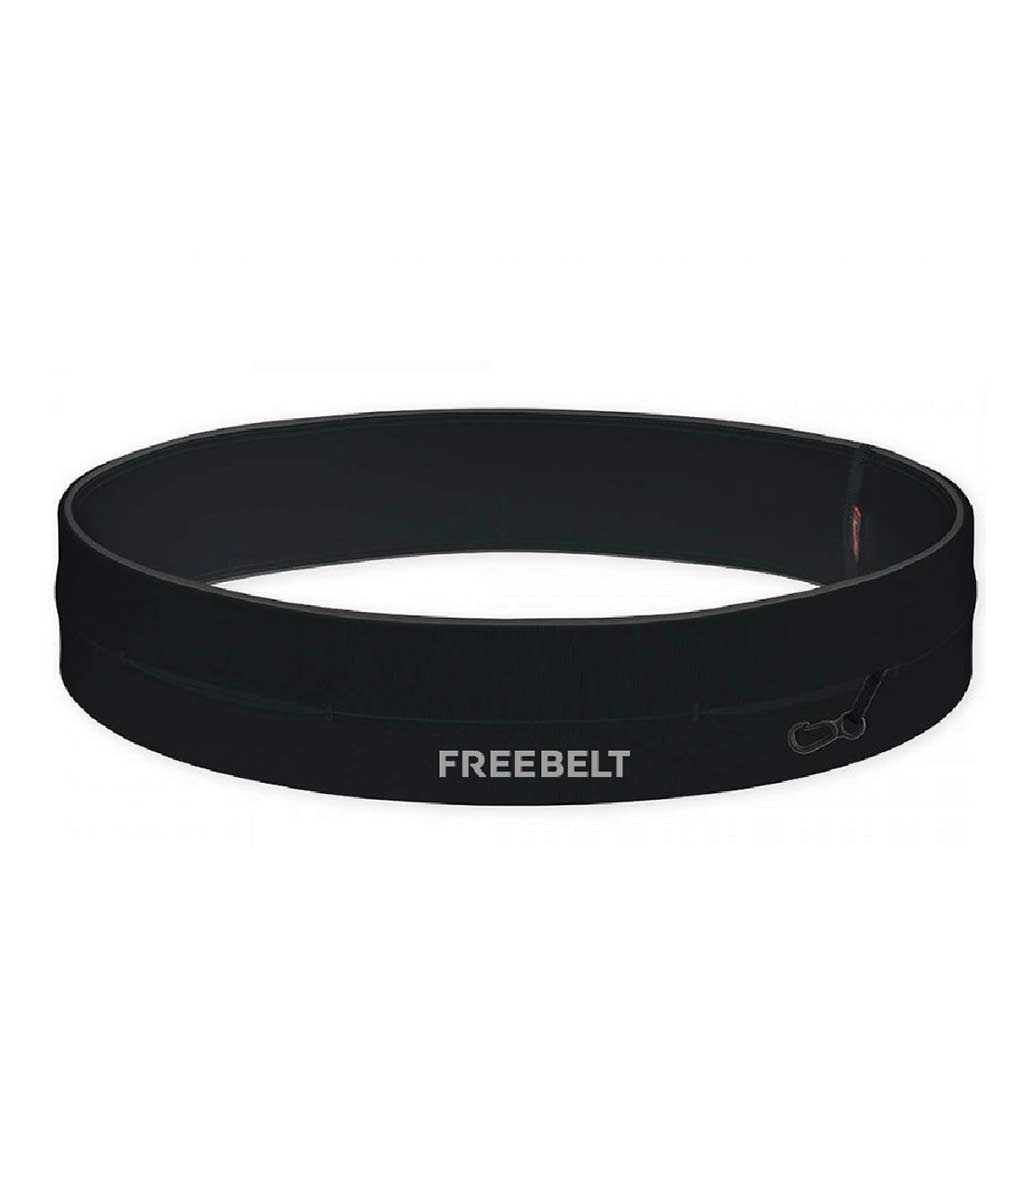 Freebelt Koşu ve Fitness Bel Kemeri Siyah